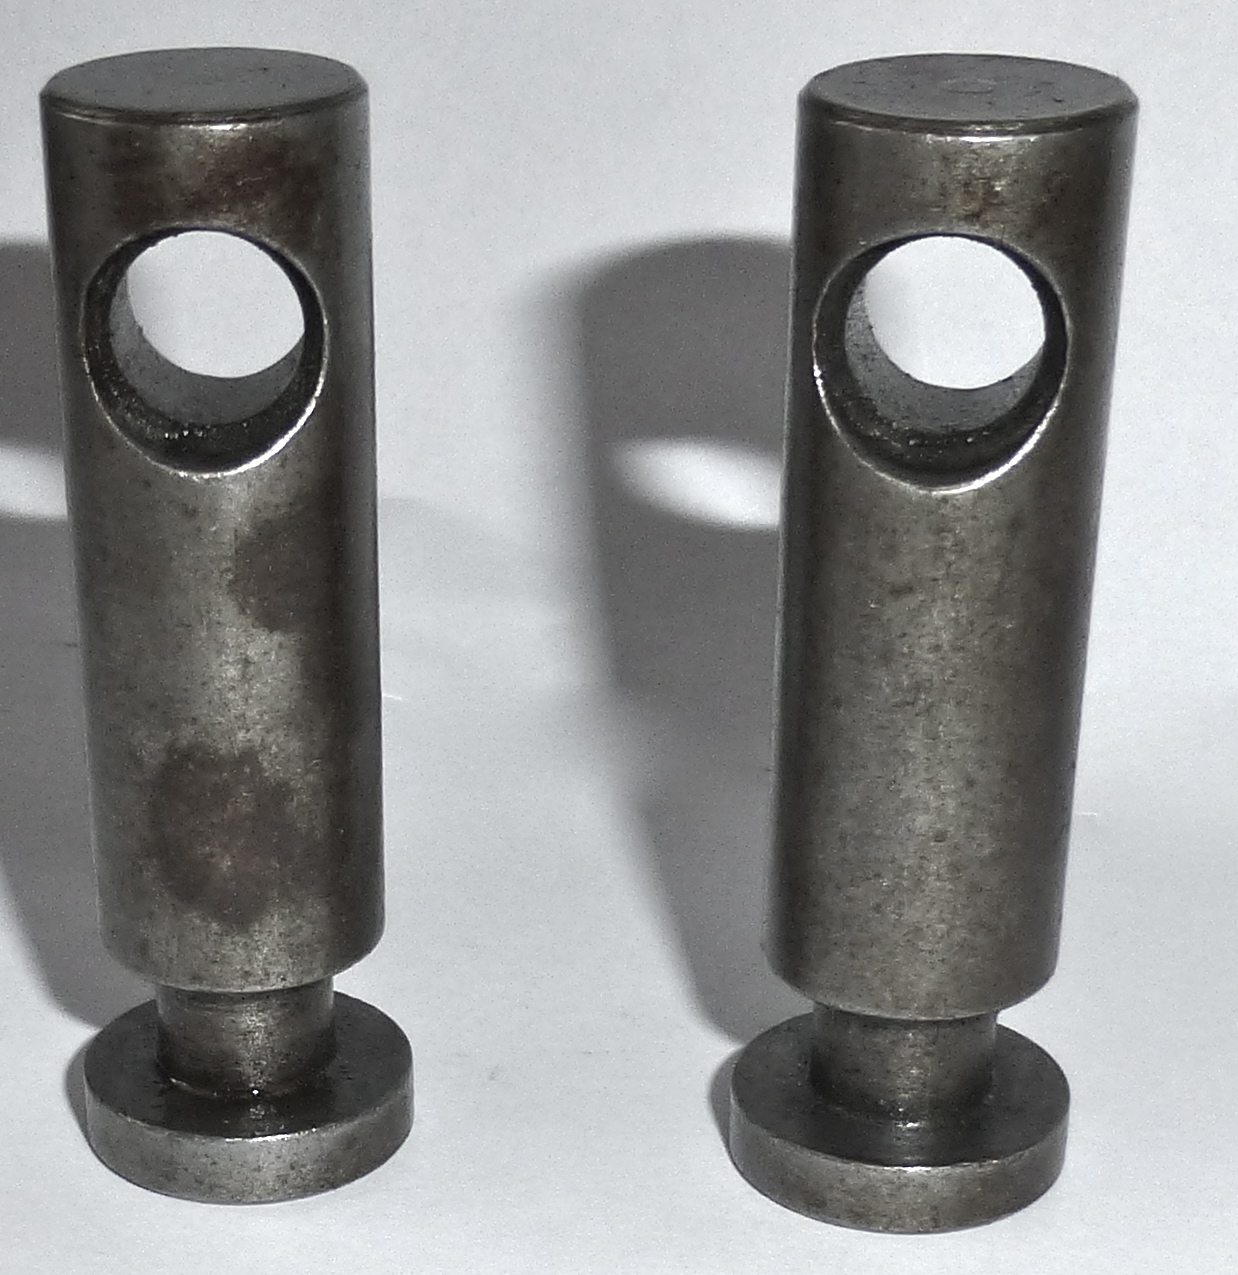 P1050487